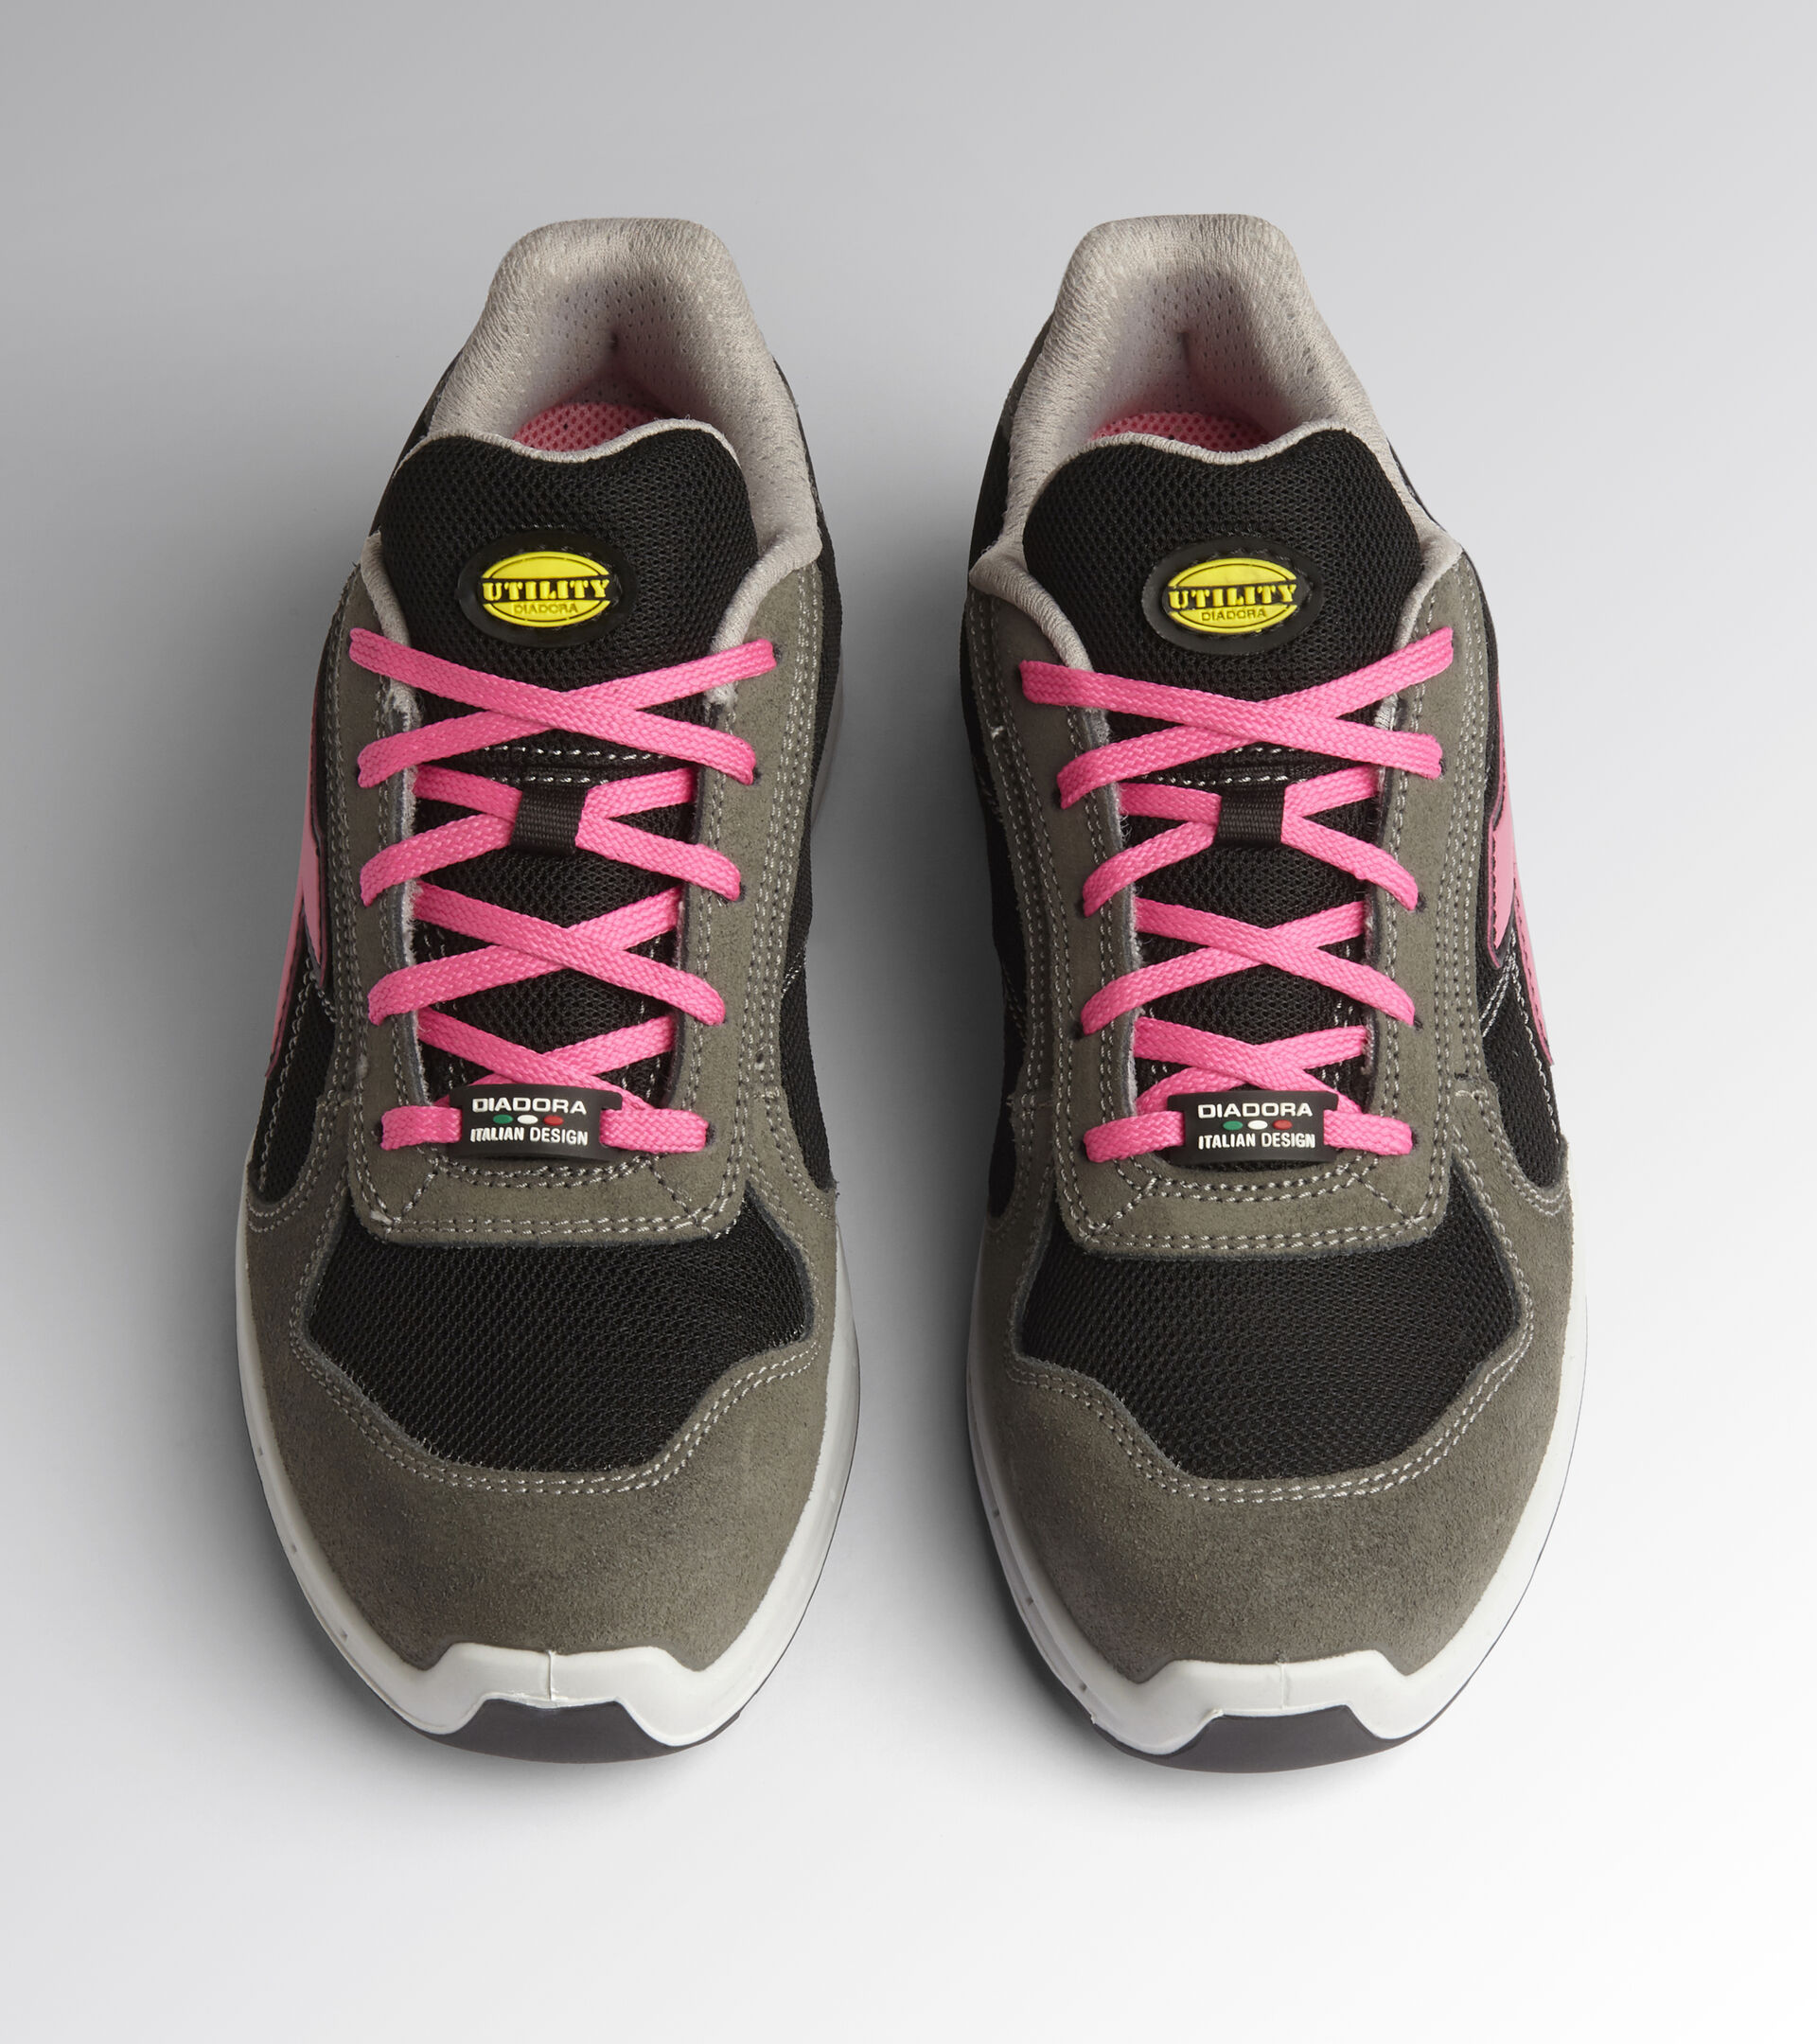 Footwear Utility UNISEX RUN NET AIRBOX LOW S1P SRC SMOKE/BLACK Utility